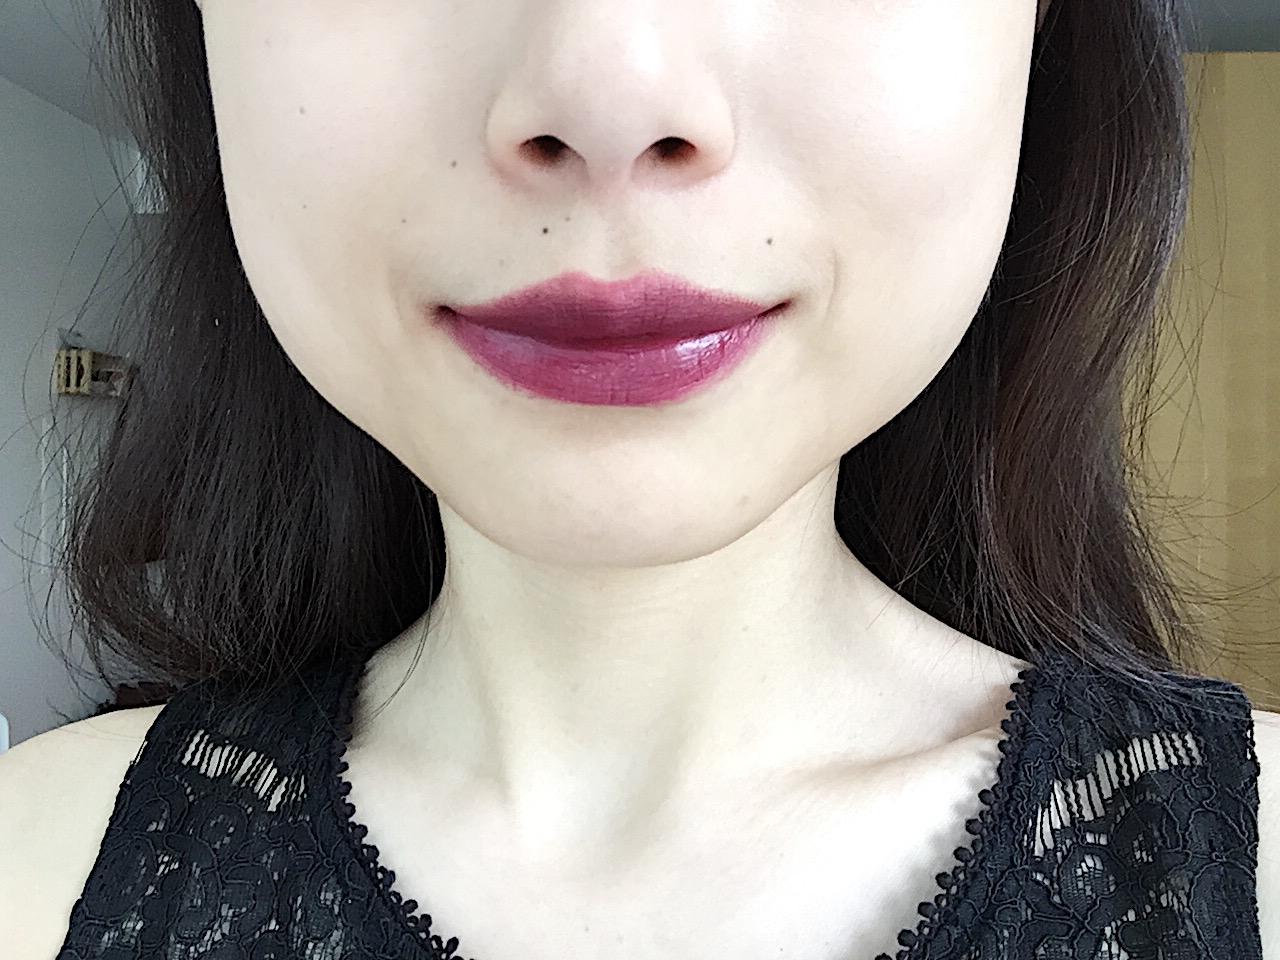 Bad Girl Burgundy Cinder Block Chateu Labiotte Wine Lip Tint Liptint Vampy Shades